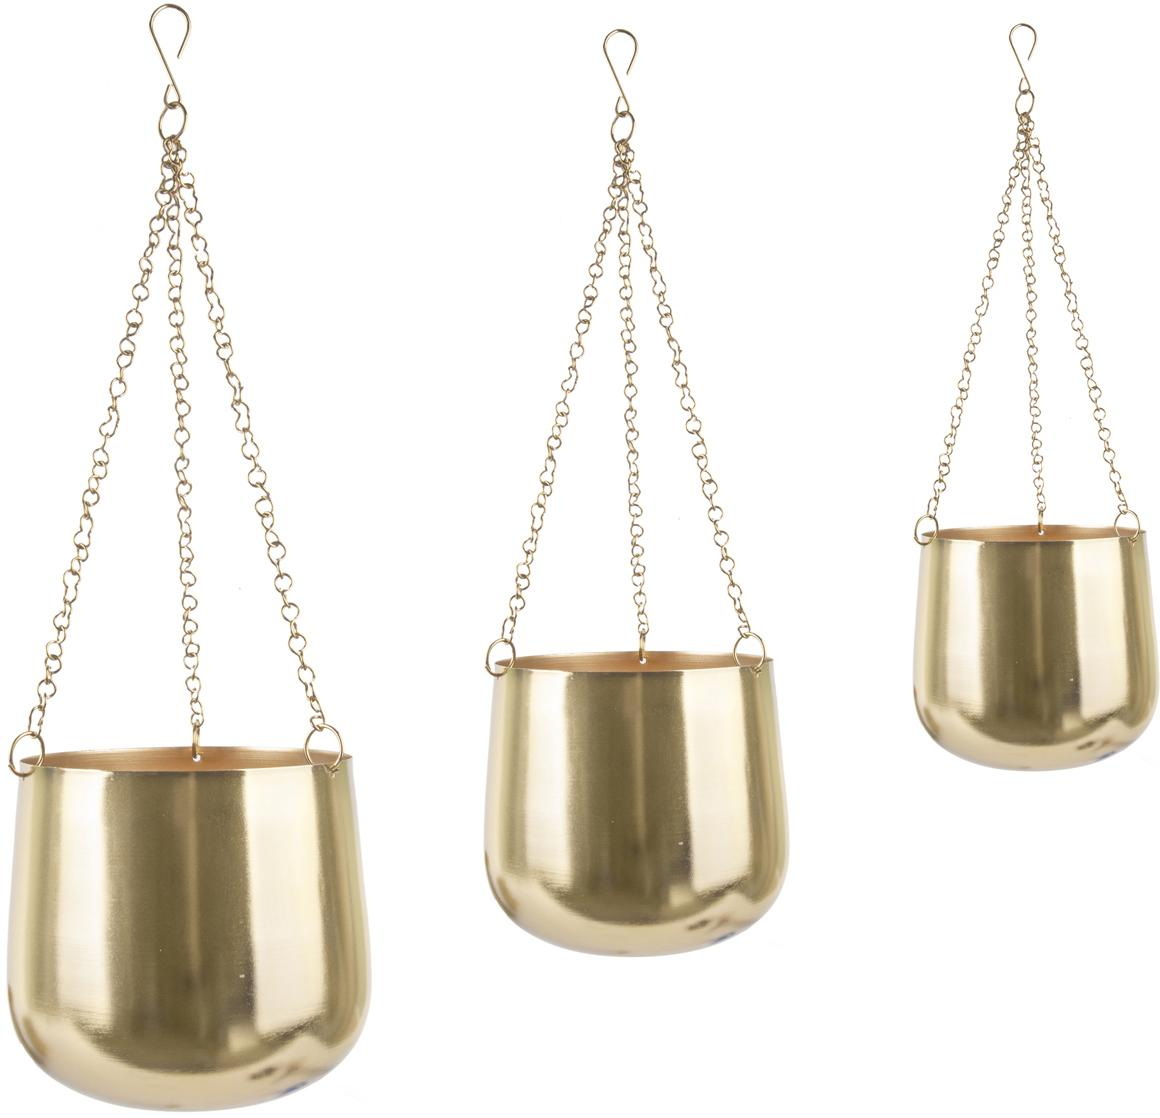 Set 3 portavasi pensili in metallo Cask, Metallo verniciato, Dorato, Set in varie misure